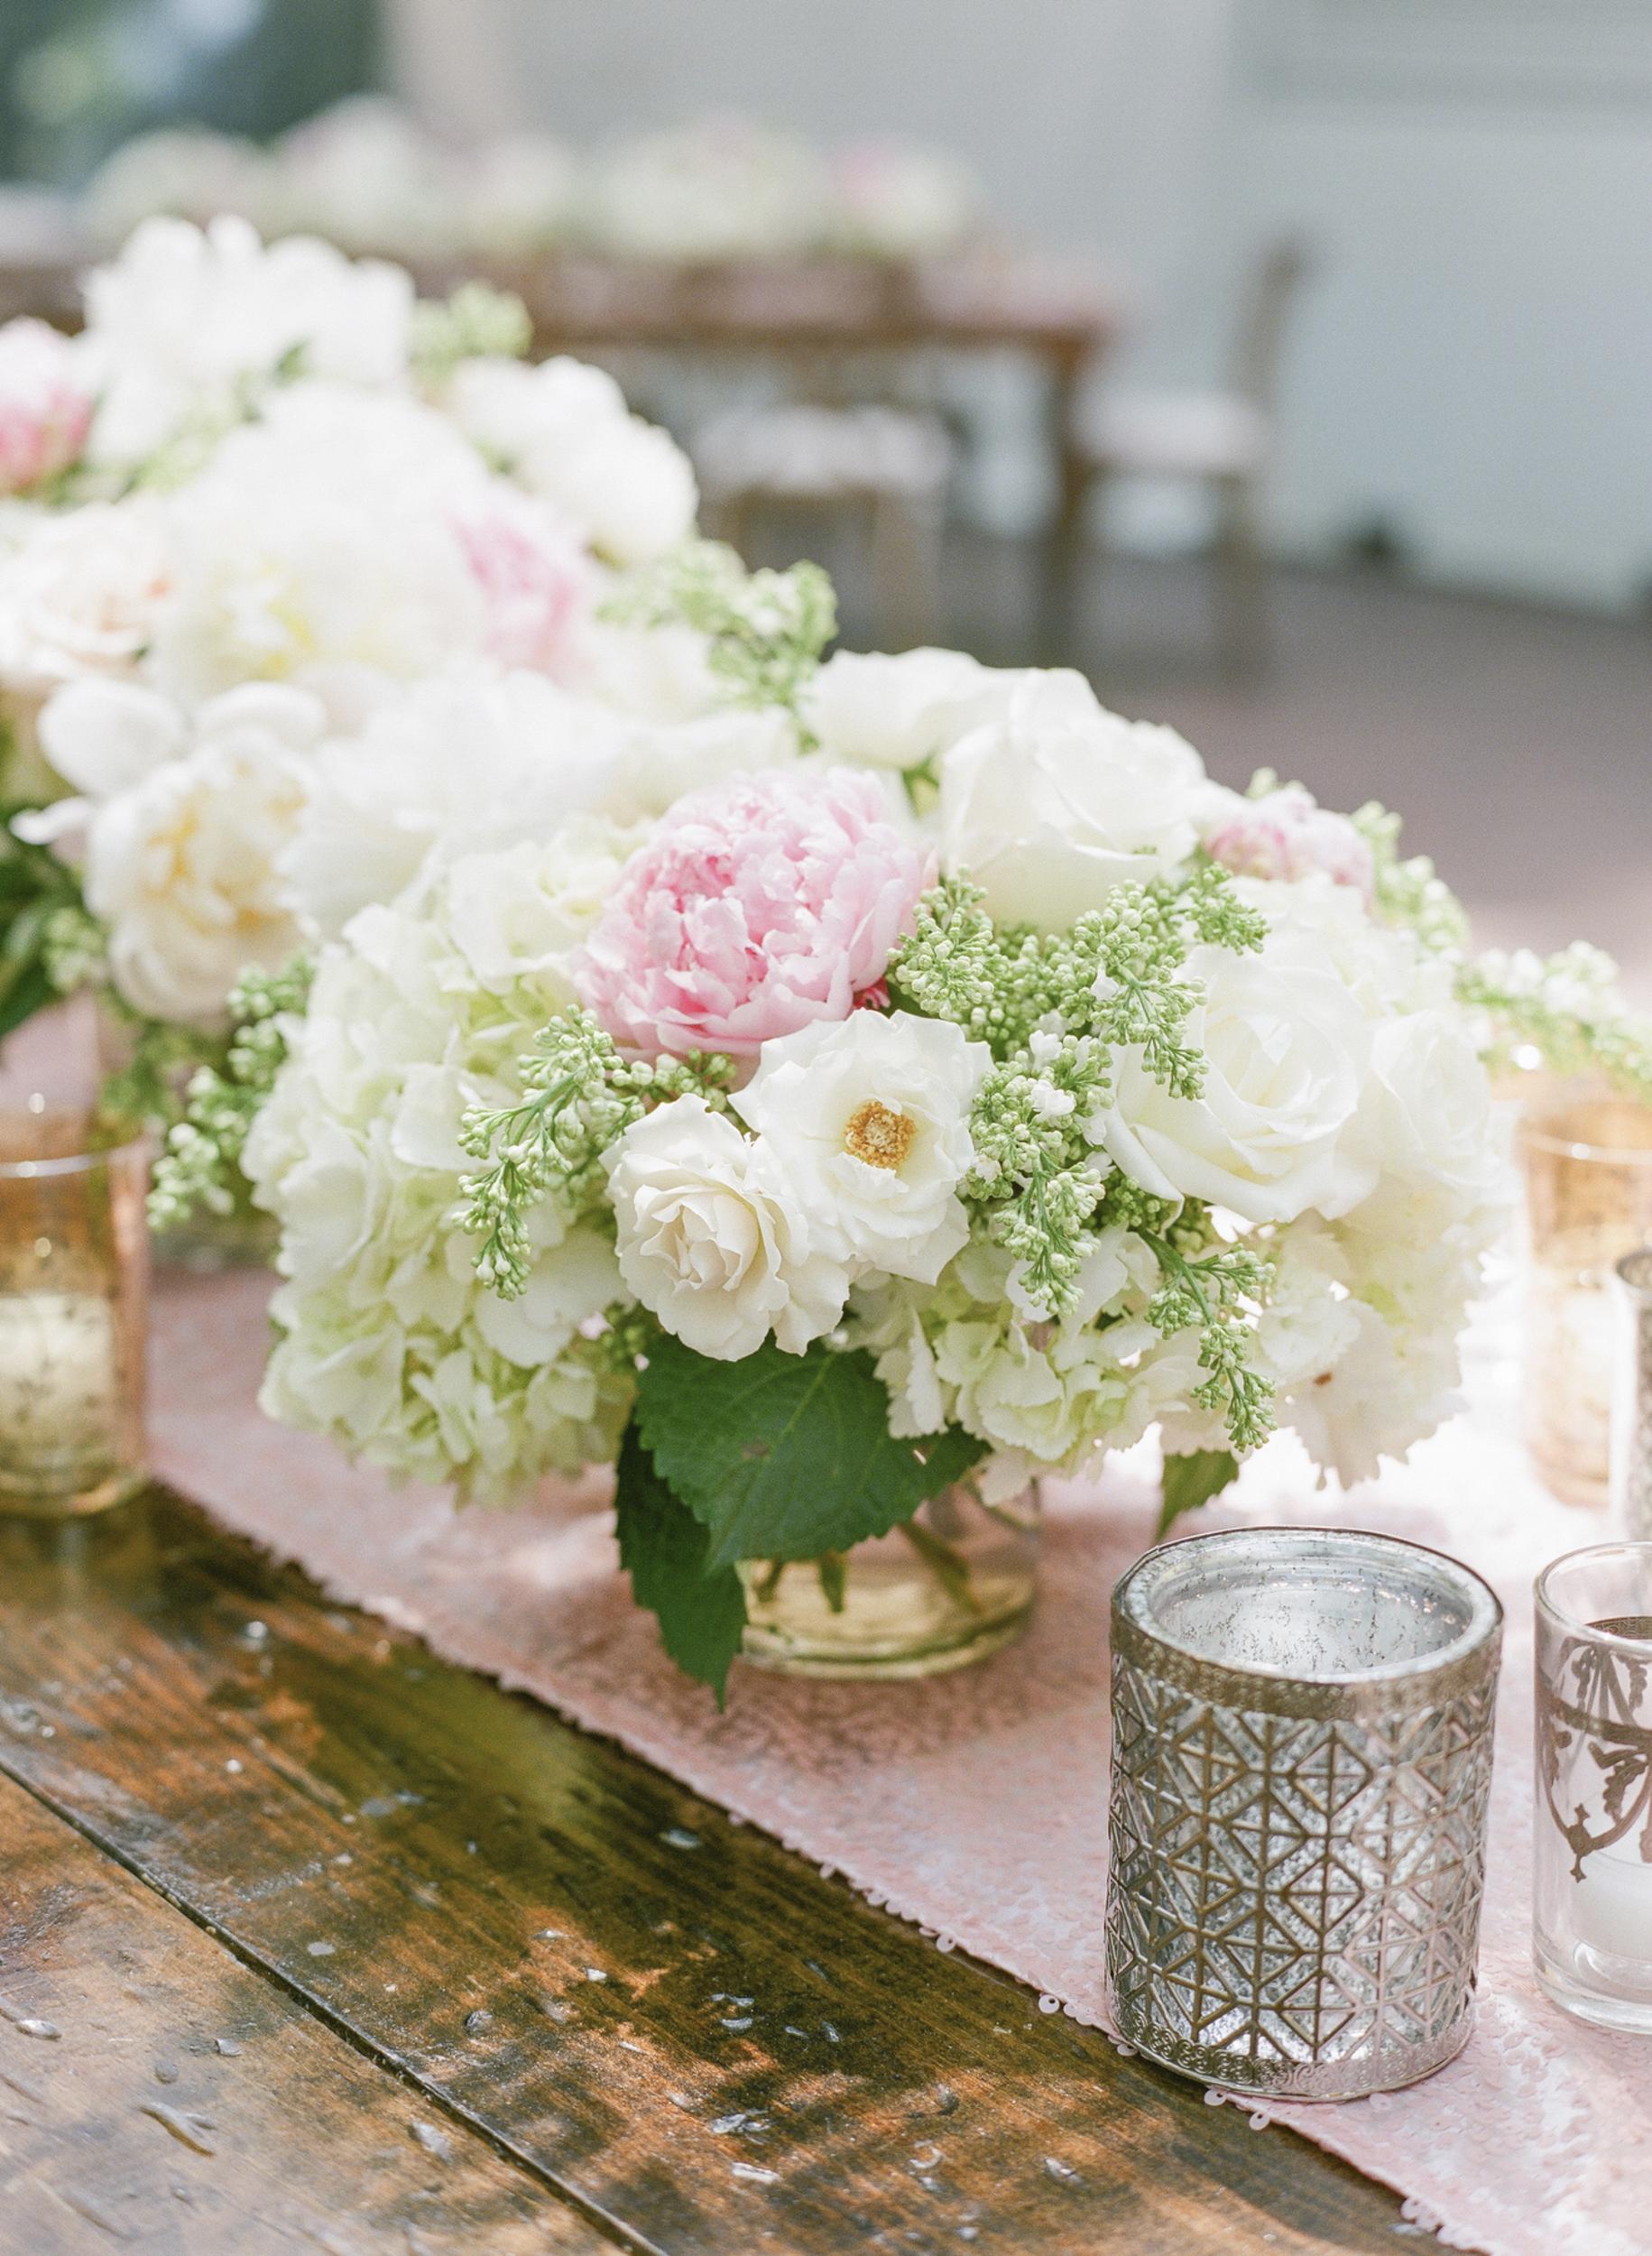 south_carolina_farm_wedding_rustic_chic_surprise_secret_luxe_wedding_bachelorette_emily_maynard_real_weddings-19.jpg